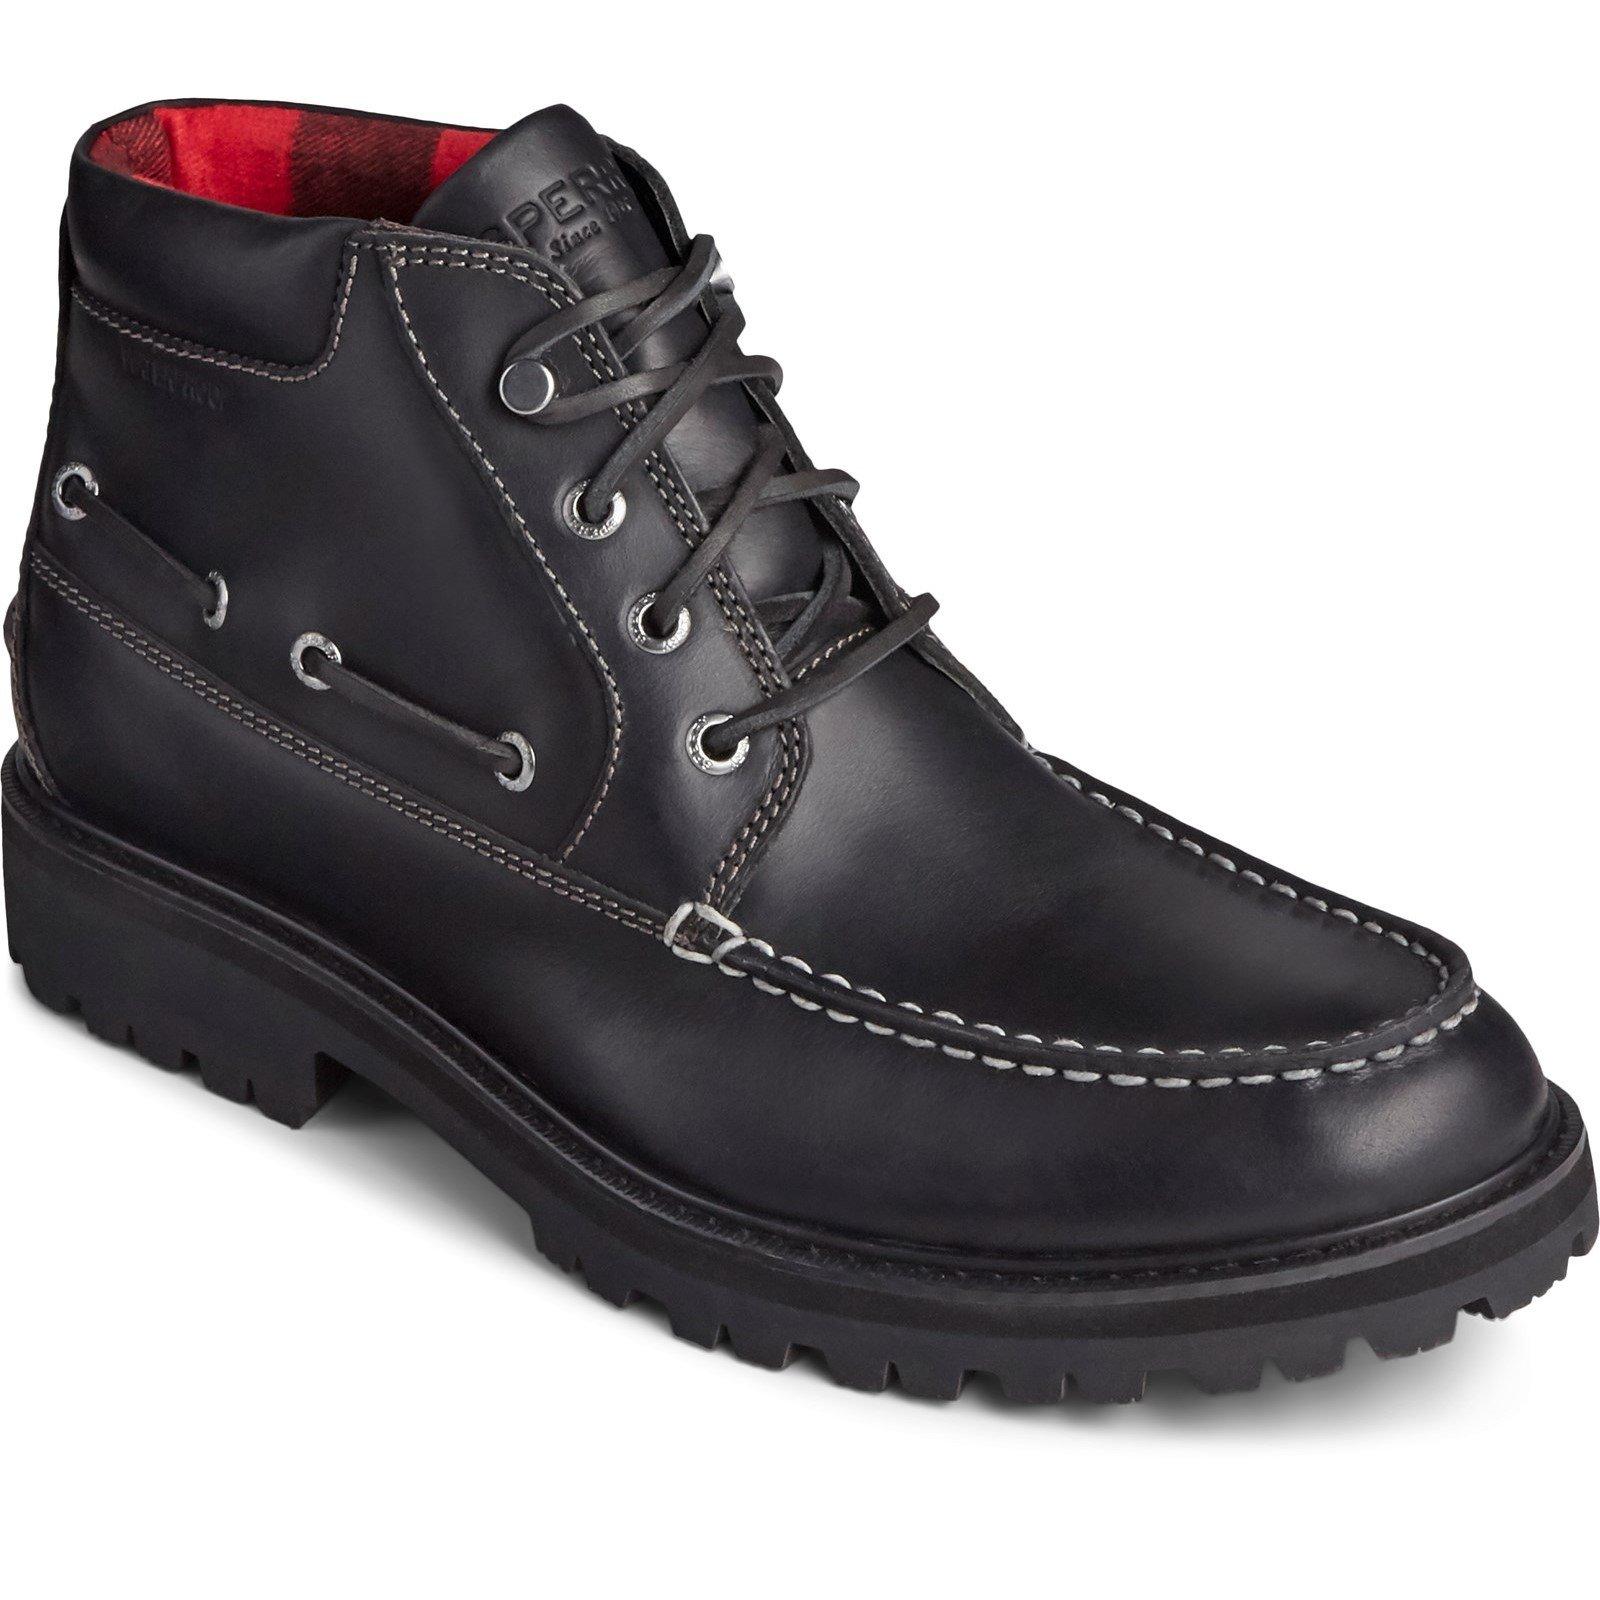 Sperry Men's Authentic Original Lug Chukka Boot Various Colours 32068 - Black 7